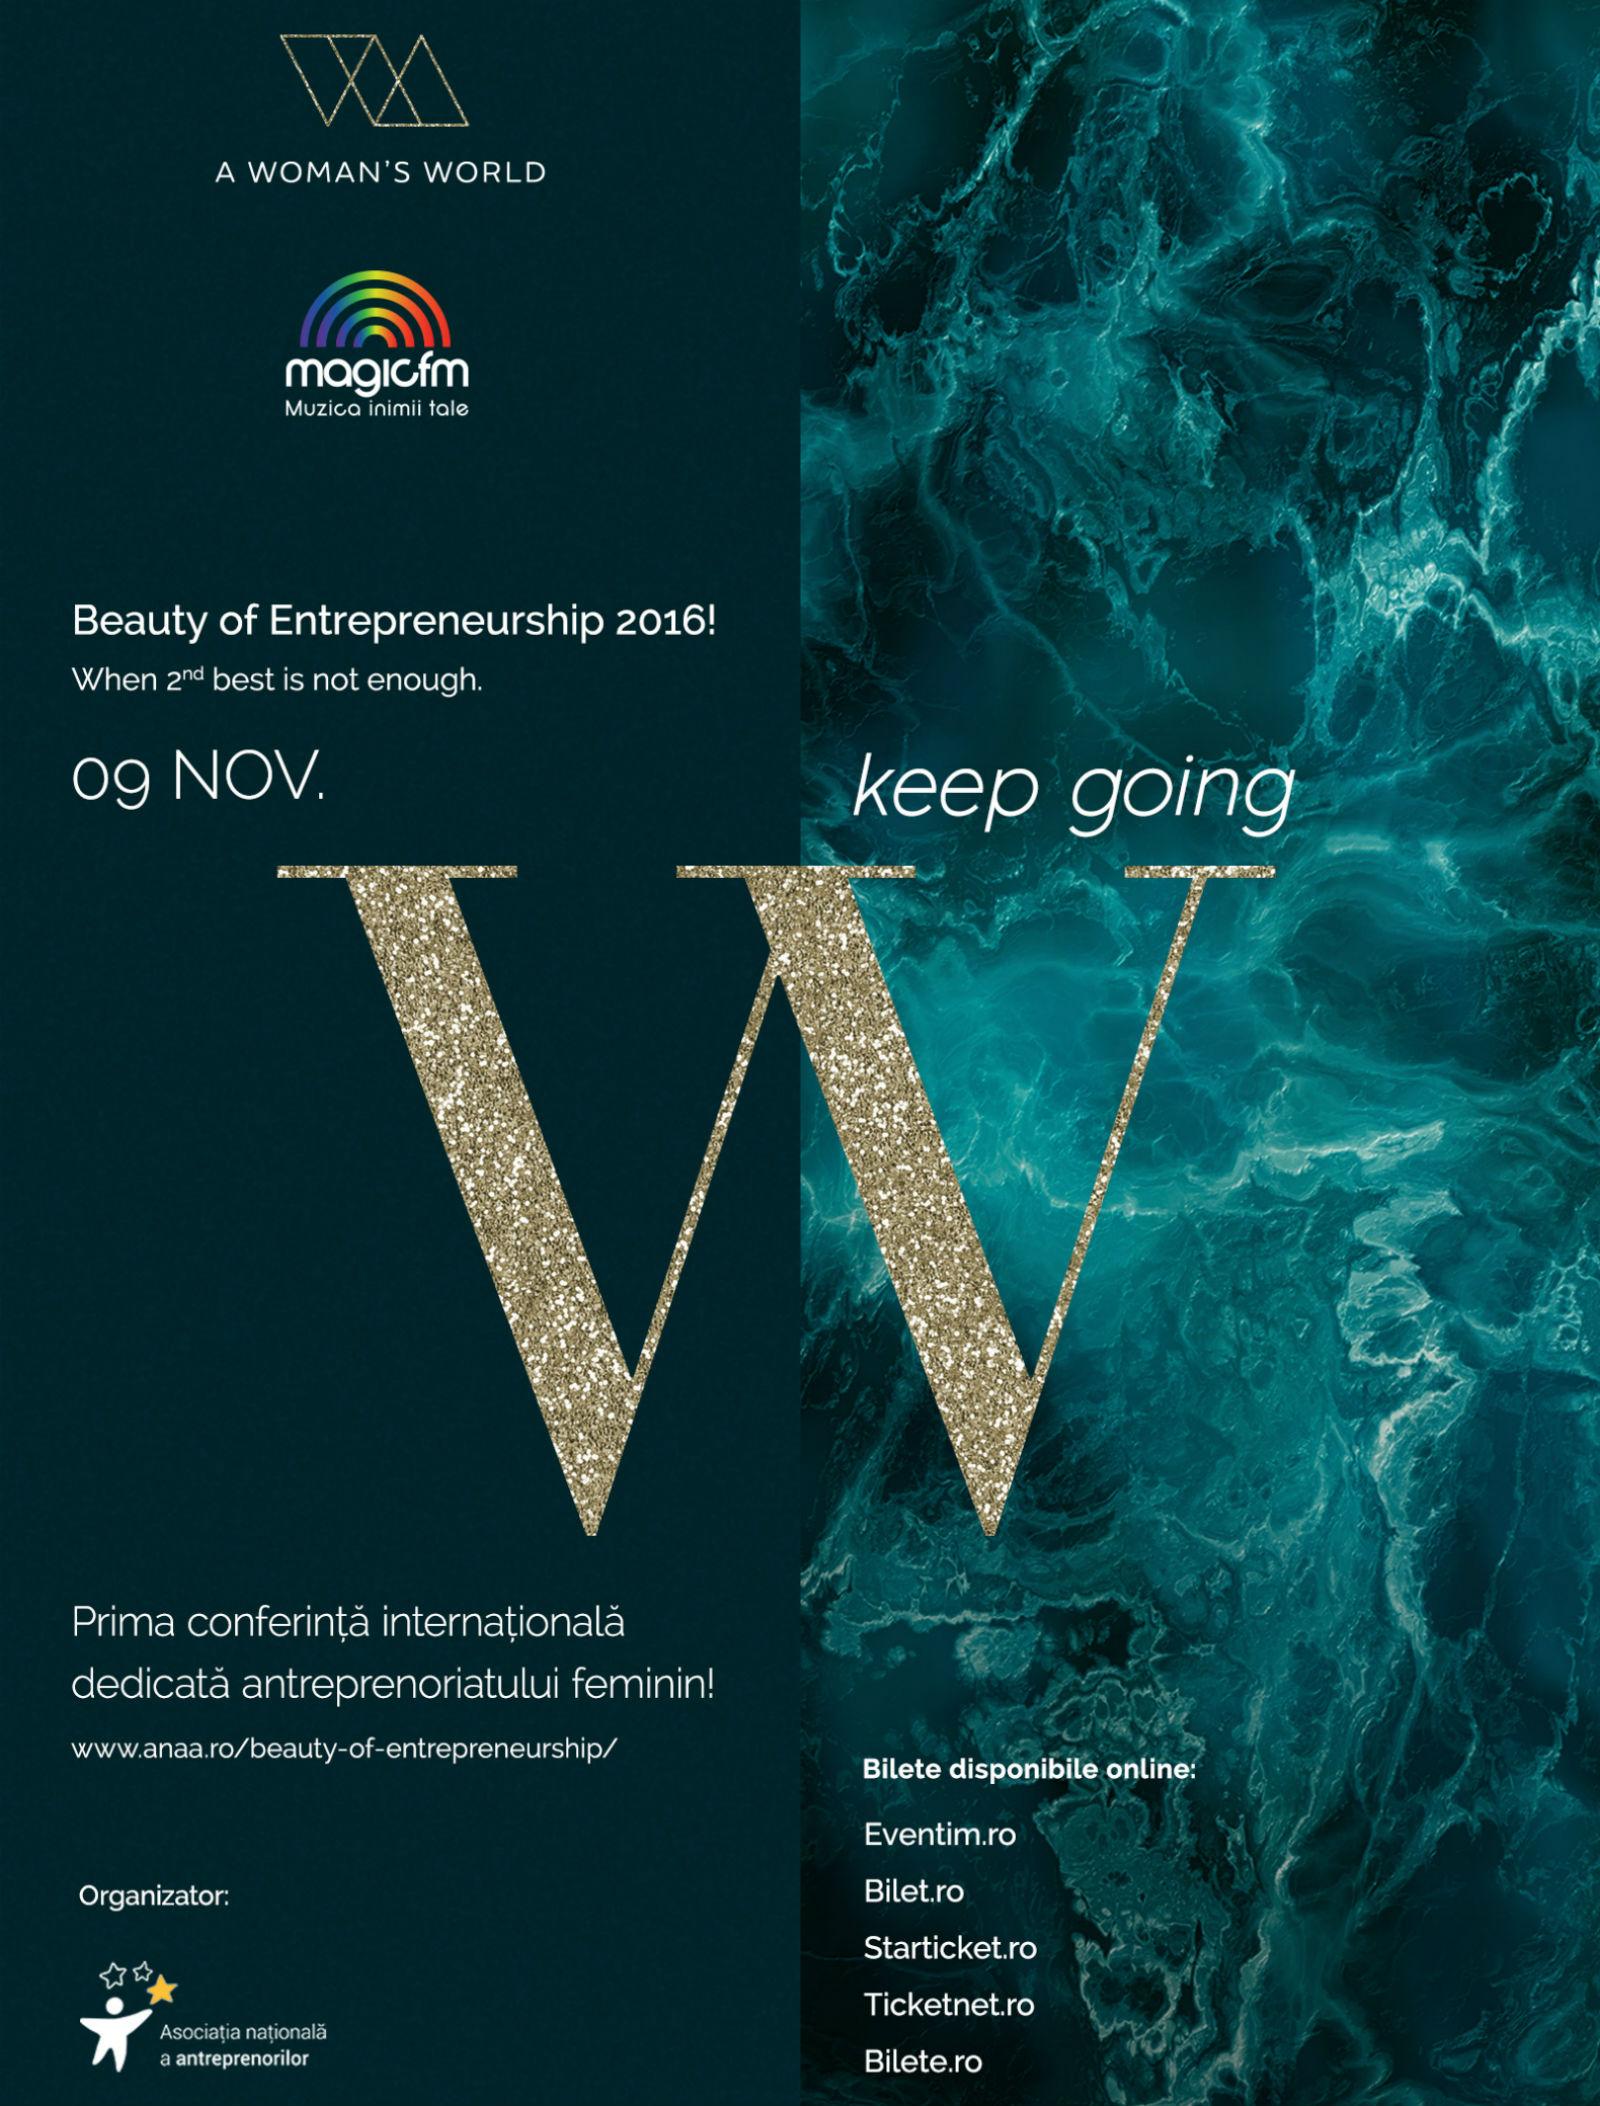 Beauty of Entrepreneurship: Redescoperirea de sine în antreprenoriat